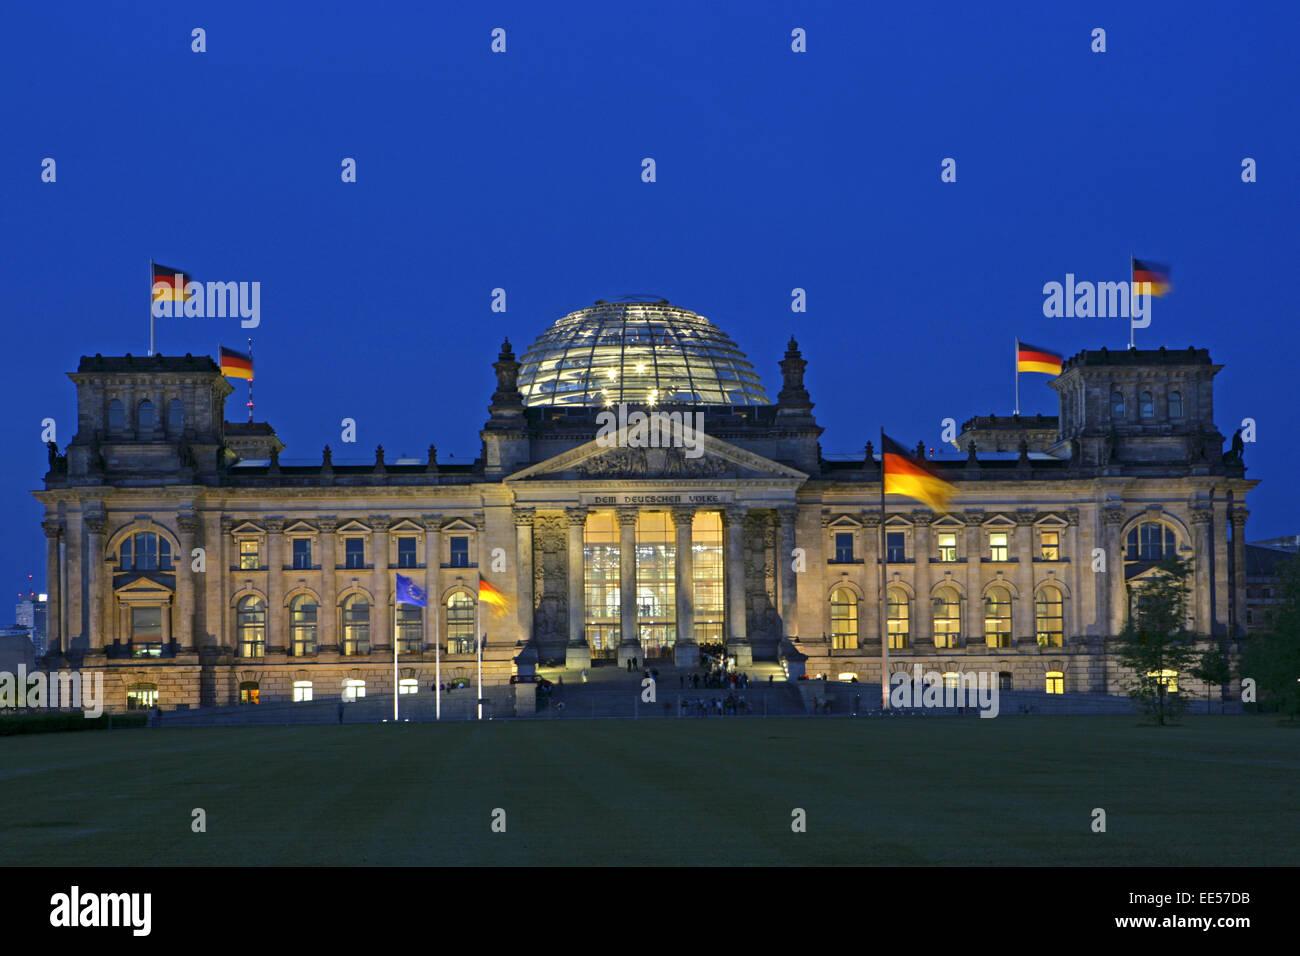 Deutschland, Berlin, Europa, Hauptstadt, Stadt, Sehenswuerdigkeit, Reichstagsgebaeude, Nationalflaggen, Besucher, - Stock Image